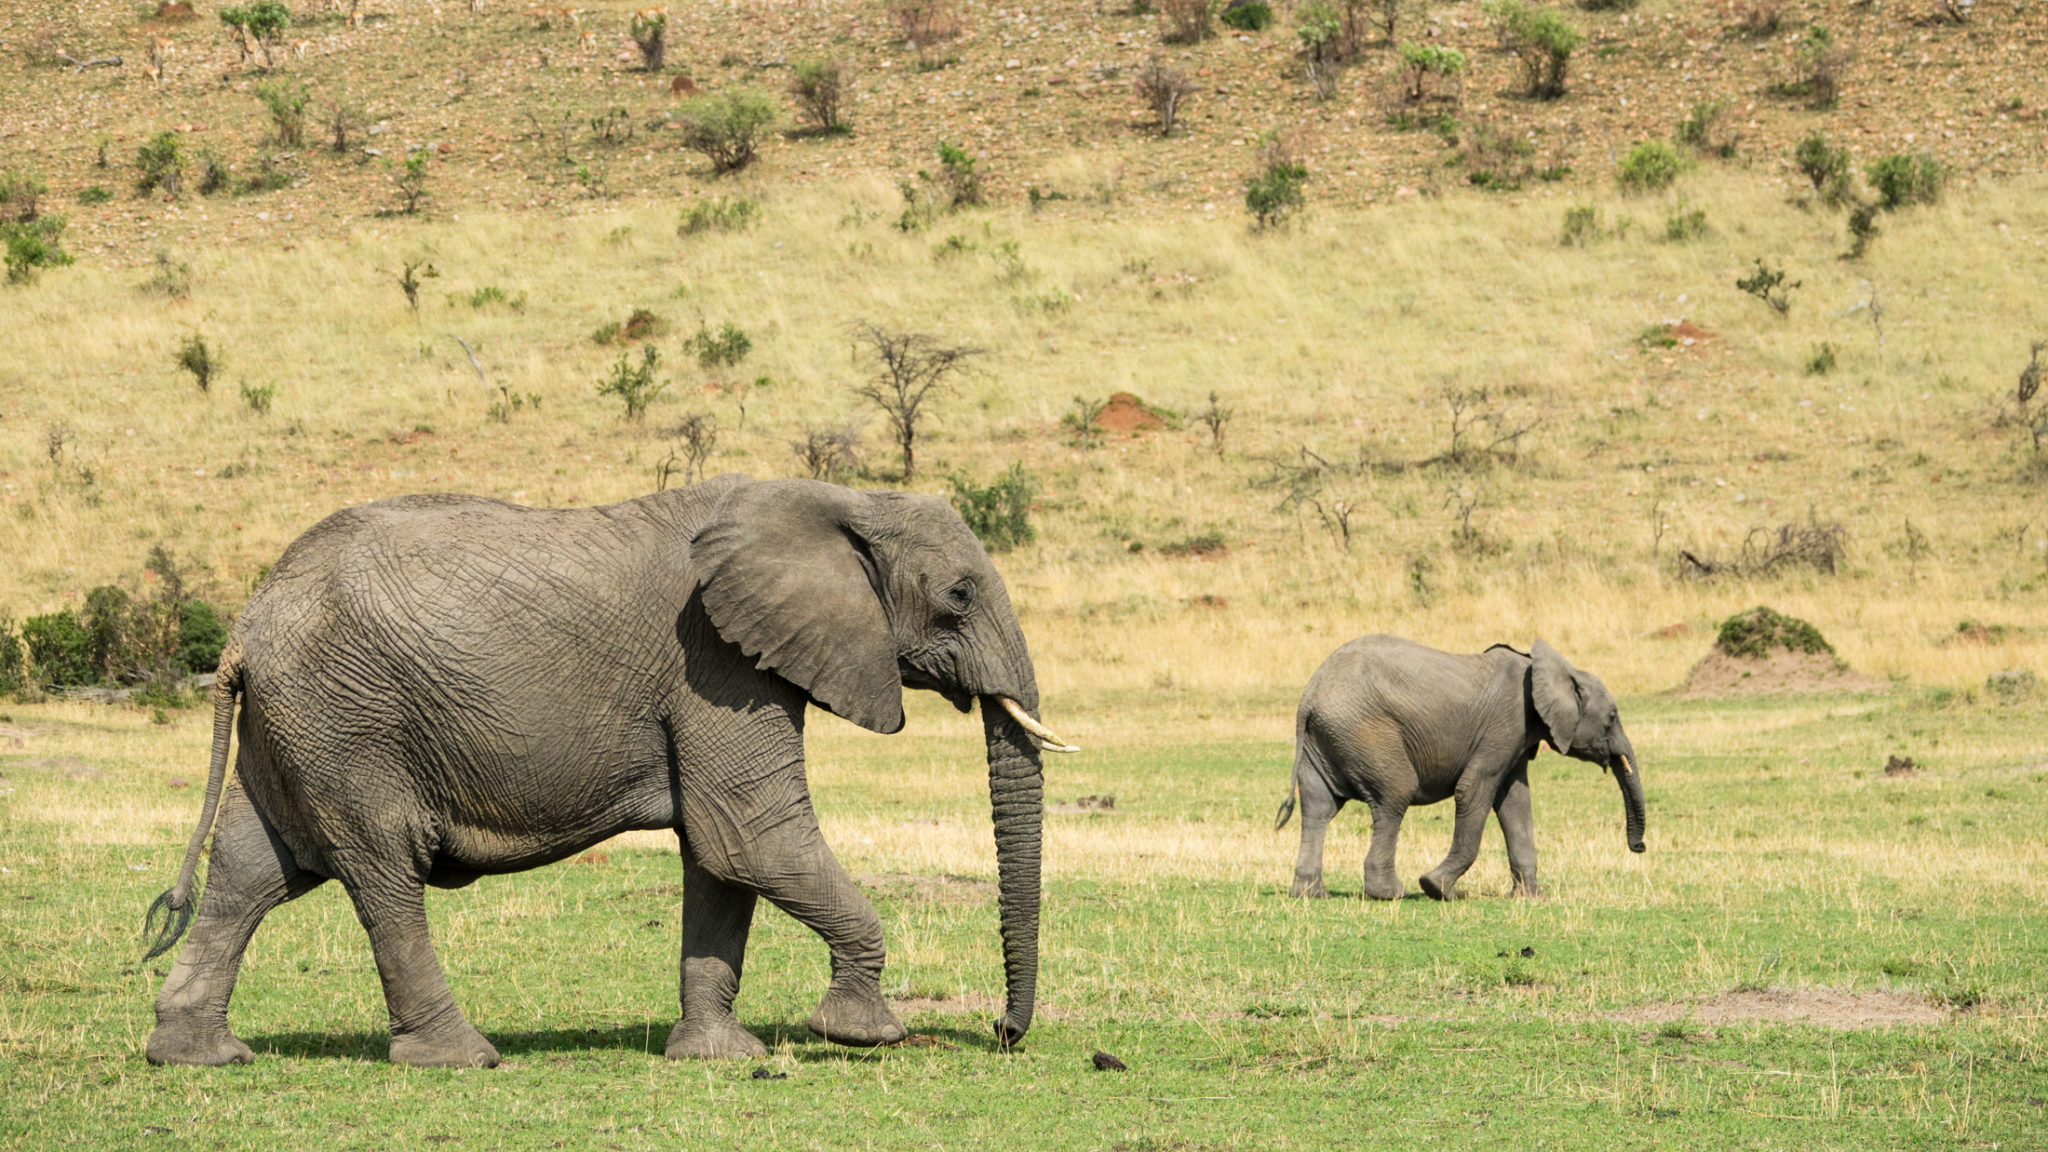 Elefantenmutter mit Kalb Serengeti, Tansania